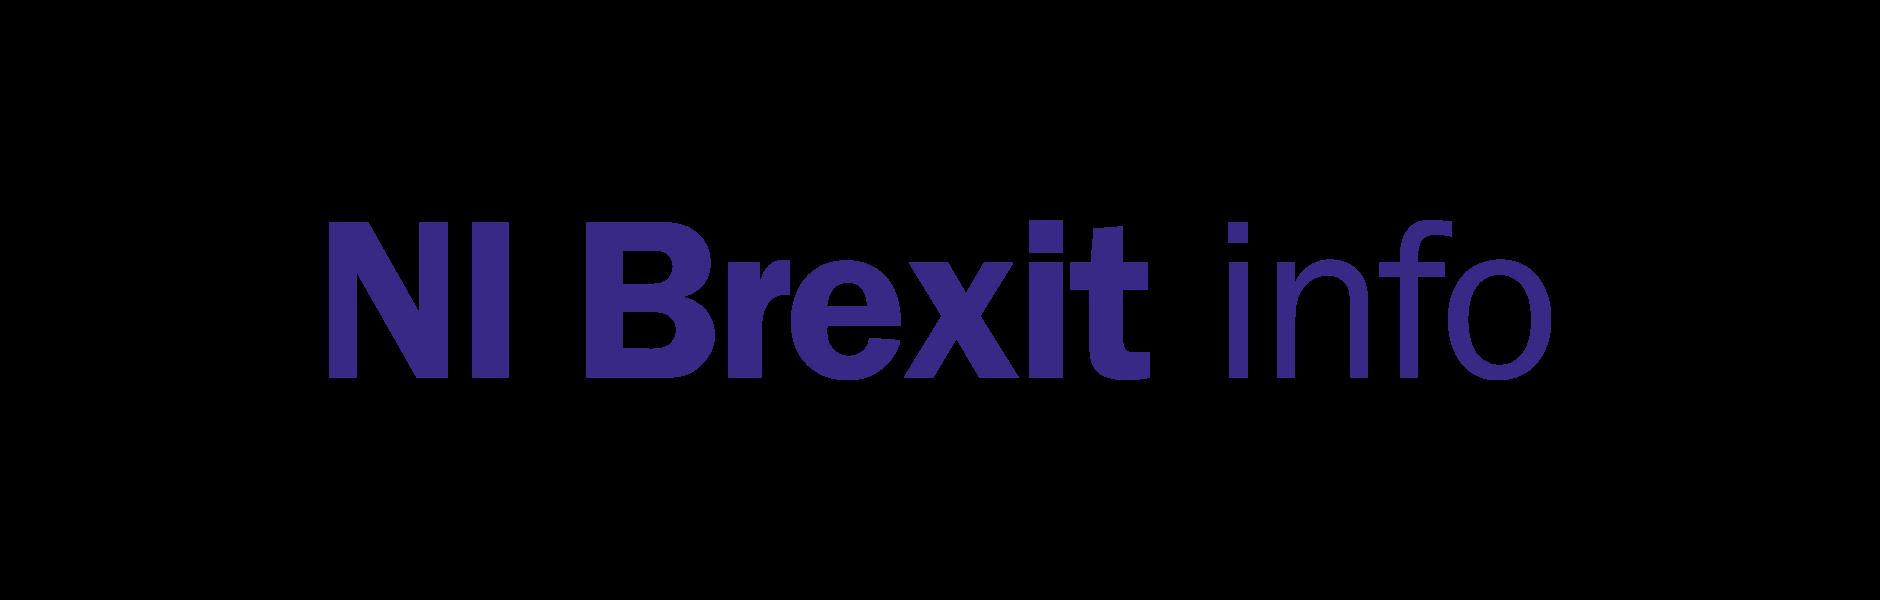 NI Brexit info